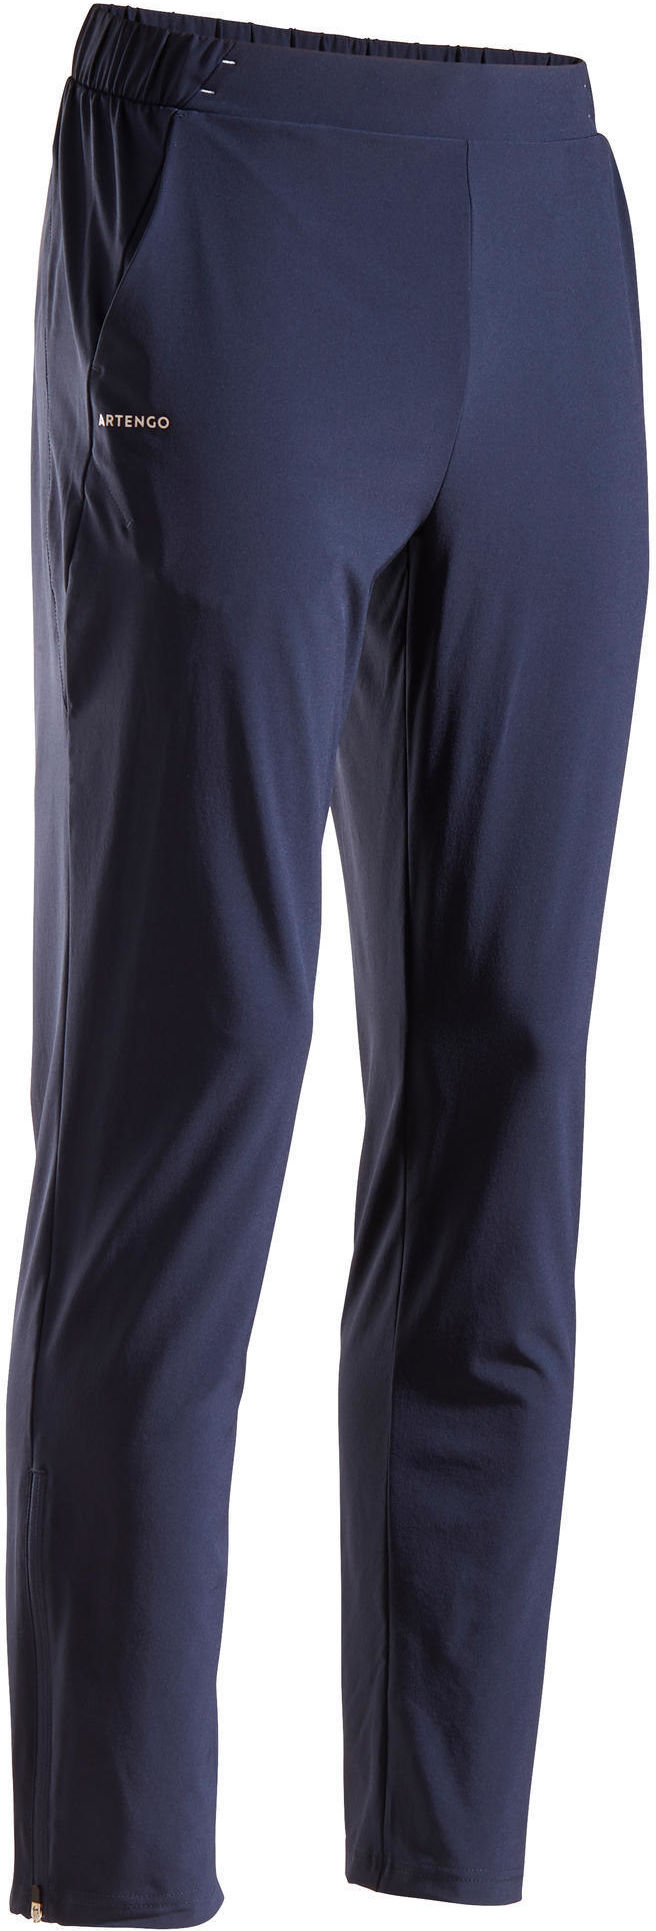 Spodnie tenis TPA 500 męskie